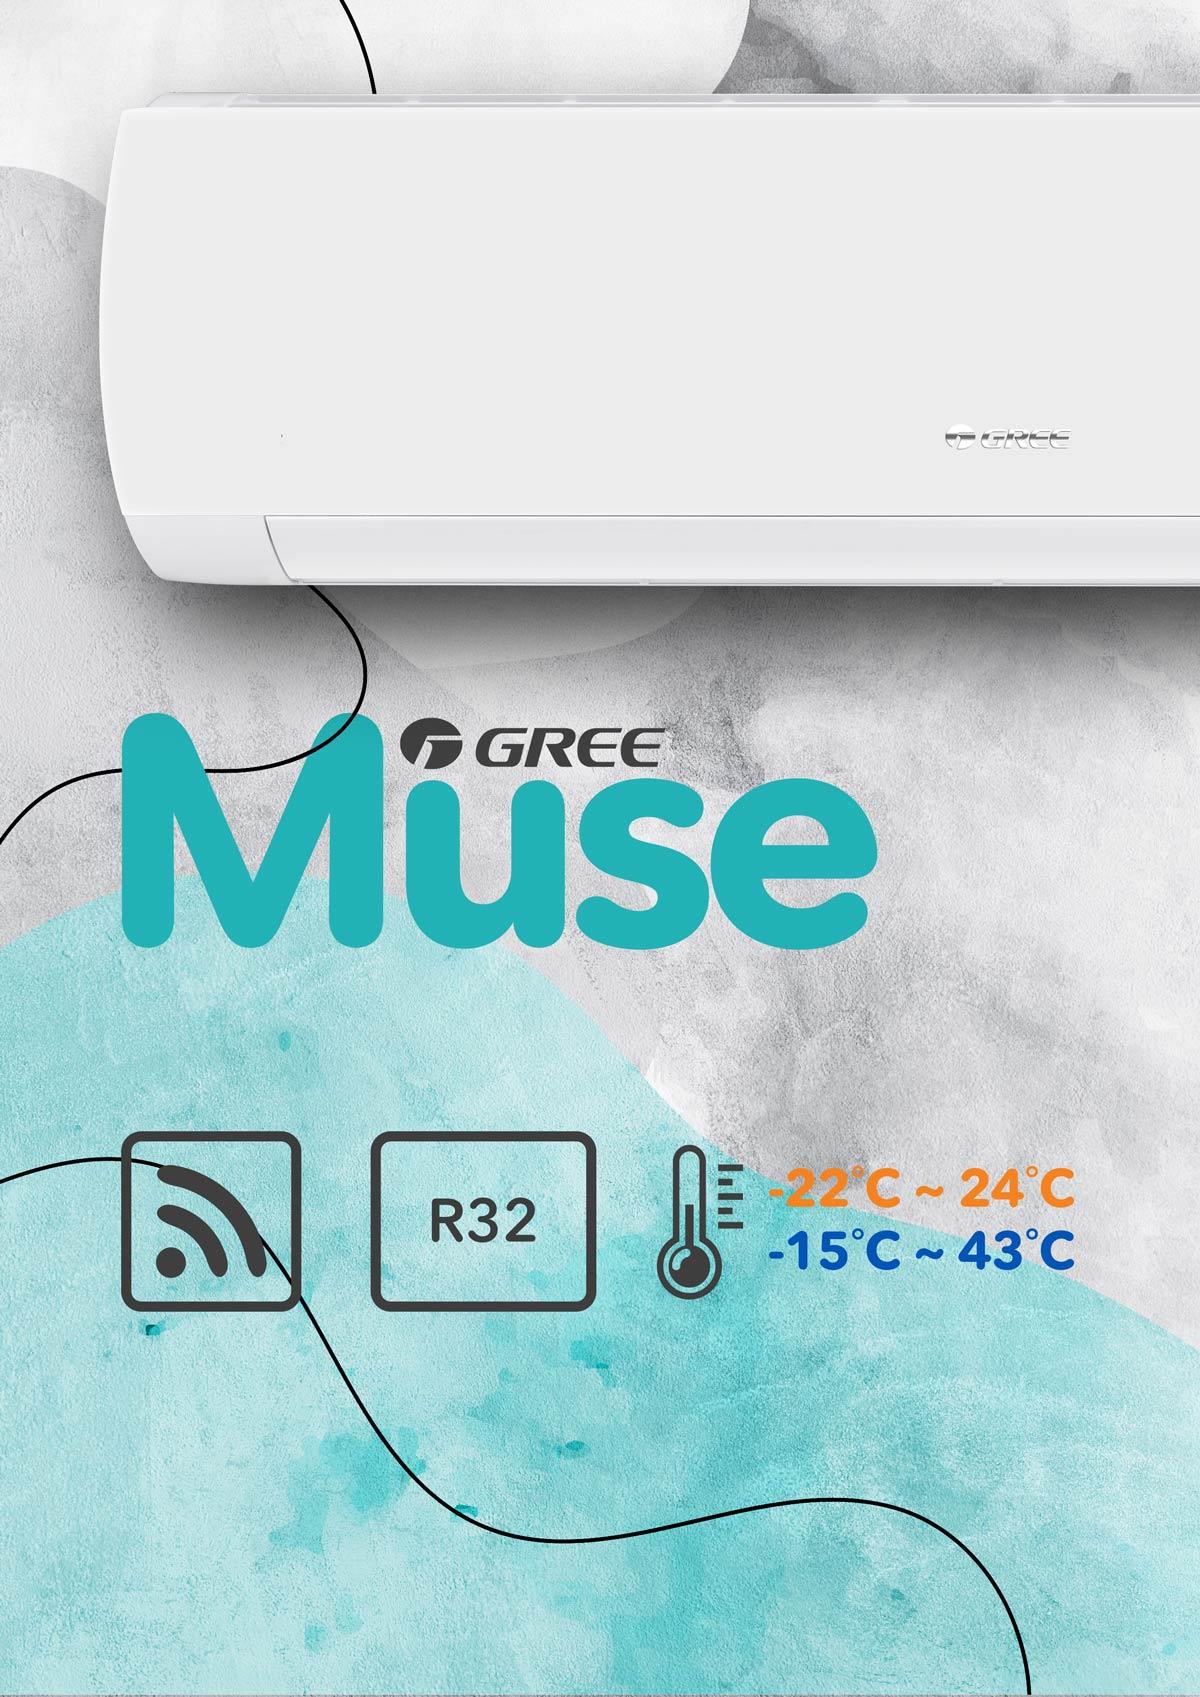 Gree Muse